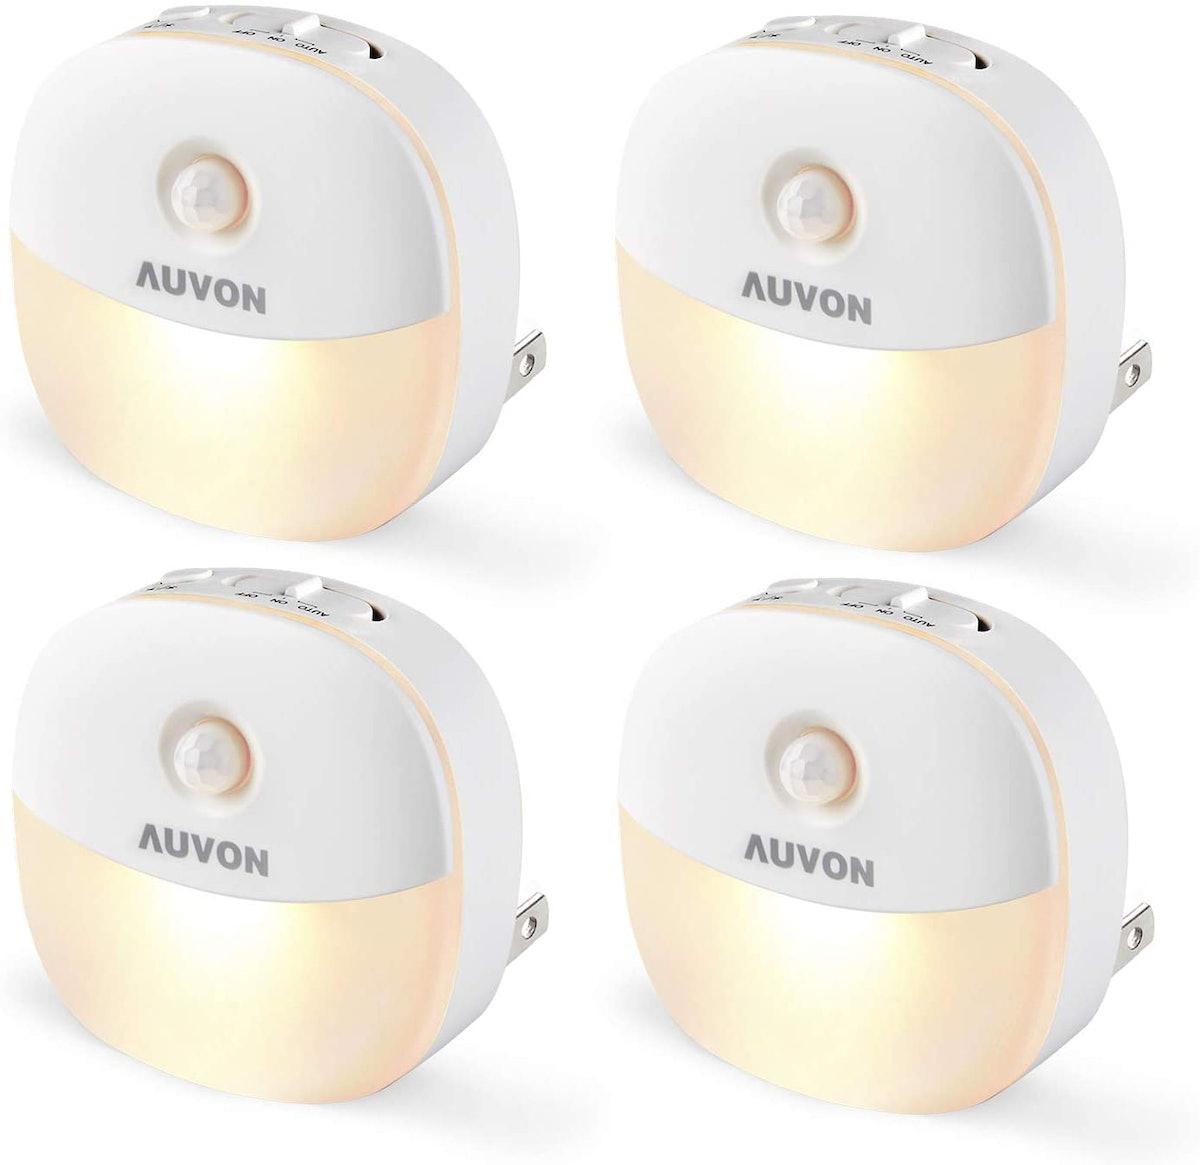 AUVON Plug-In Motion Sensor Night Lights (4 Pack)